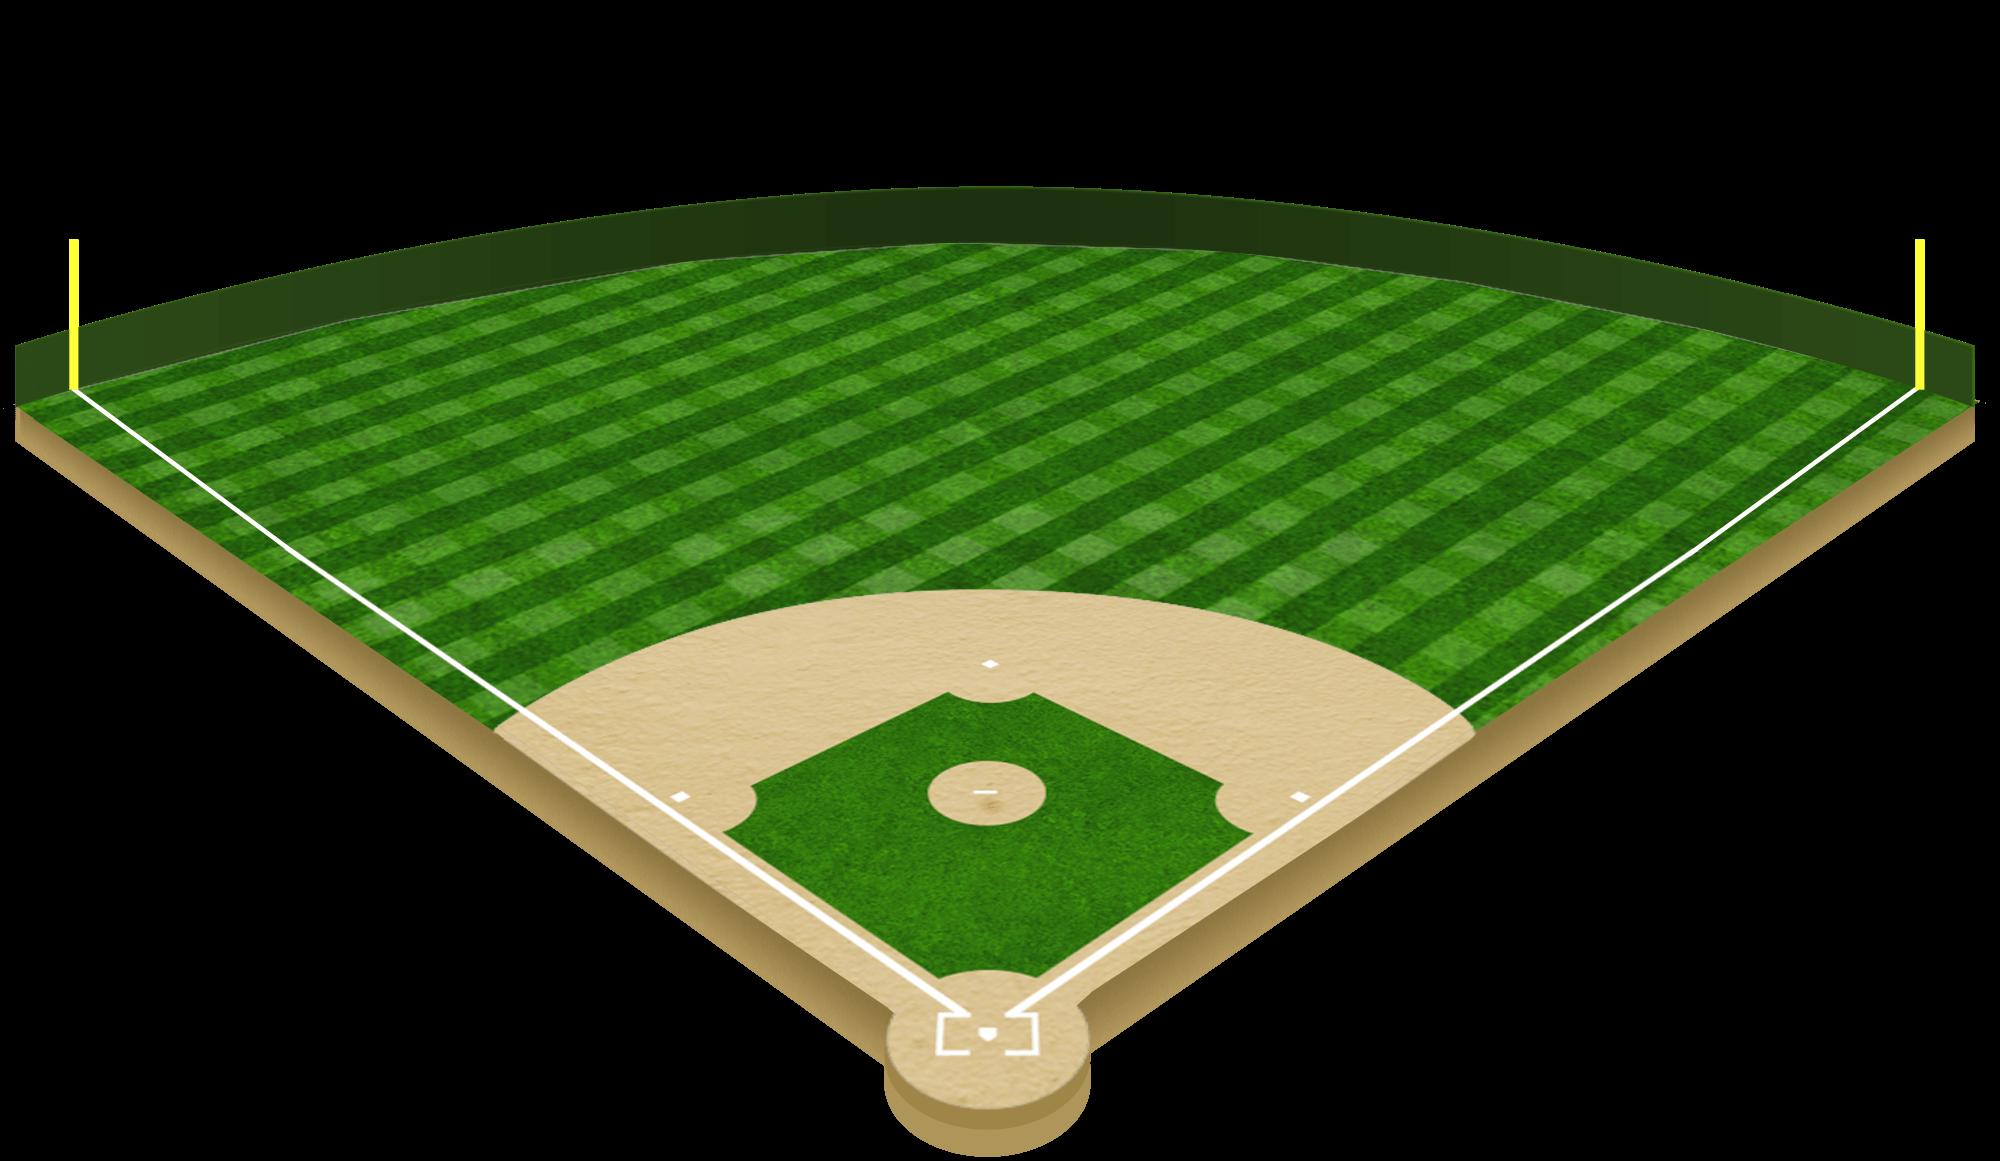 toronto vs texas baseball gamezone stats com july 4th clip art marine july 4th clip art marine